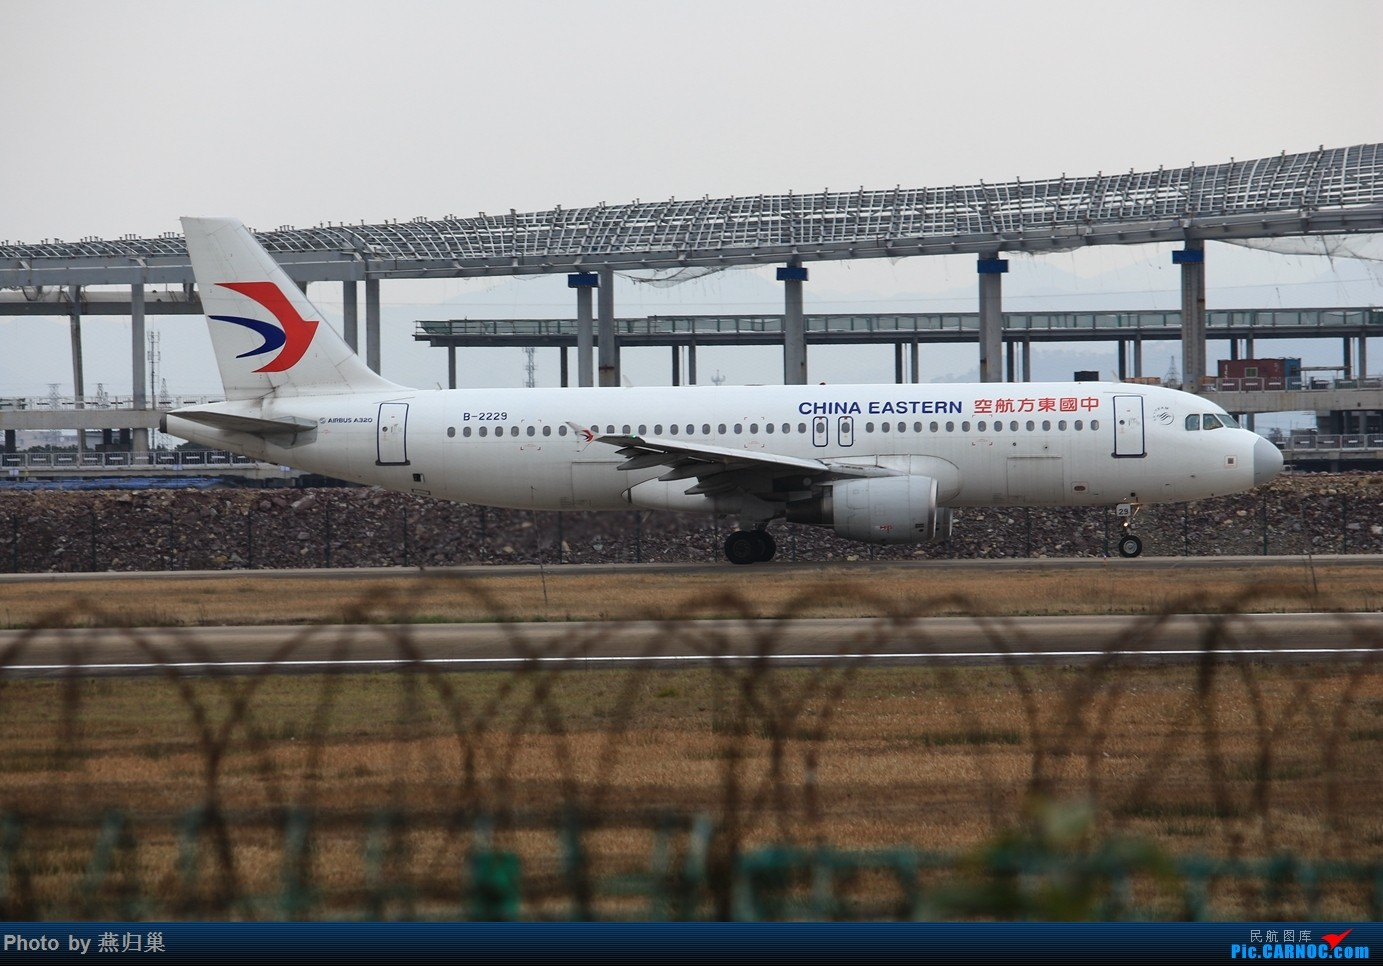 Re:[原创]【宁波飞友会】年前NGB拍机合集 AIRBUS A320-200 B-2229 中国宁波栎社国际机场